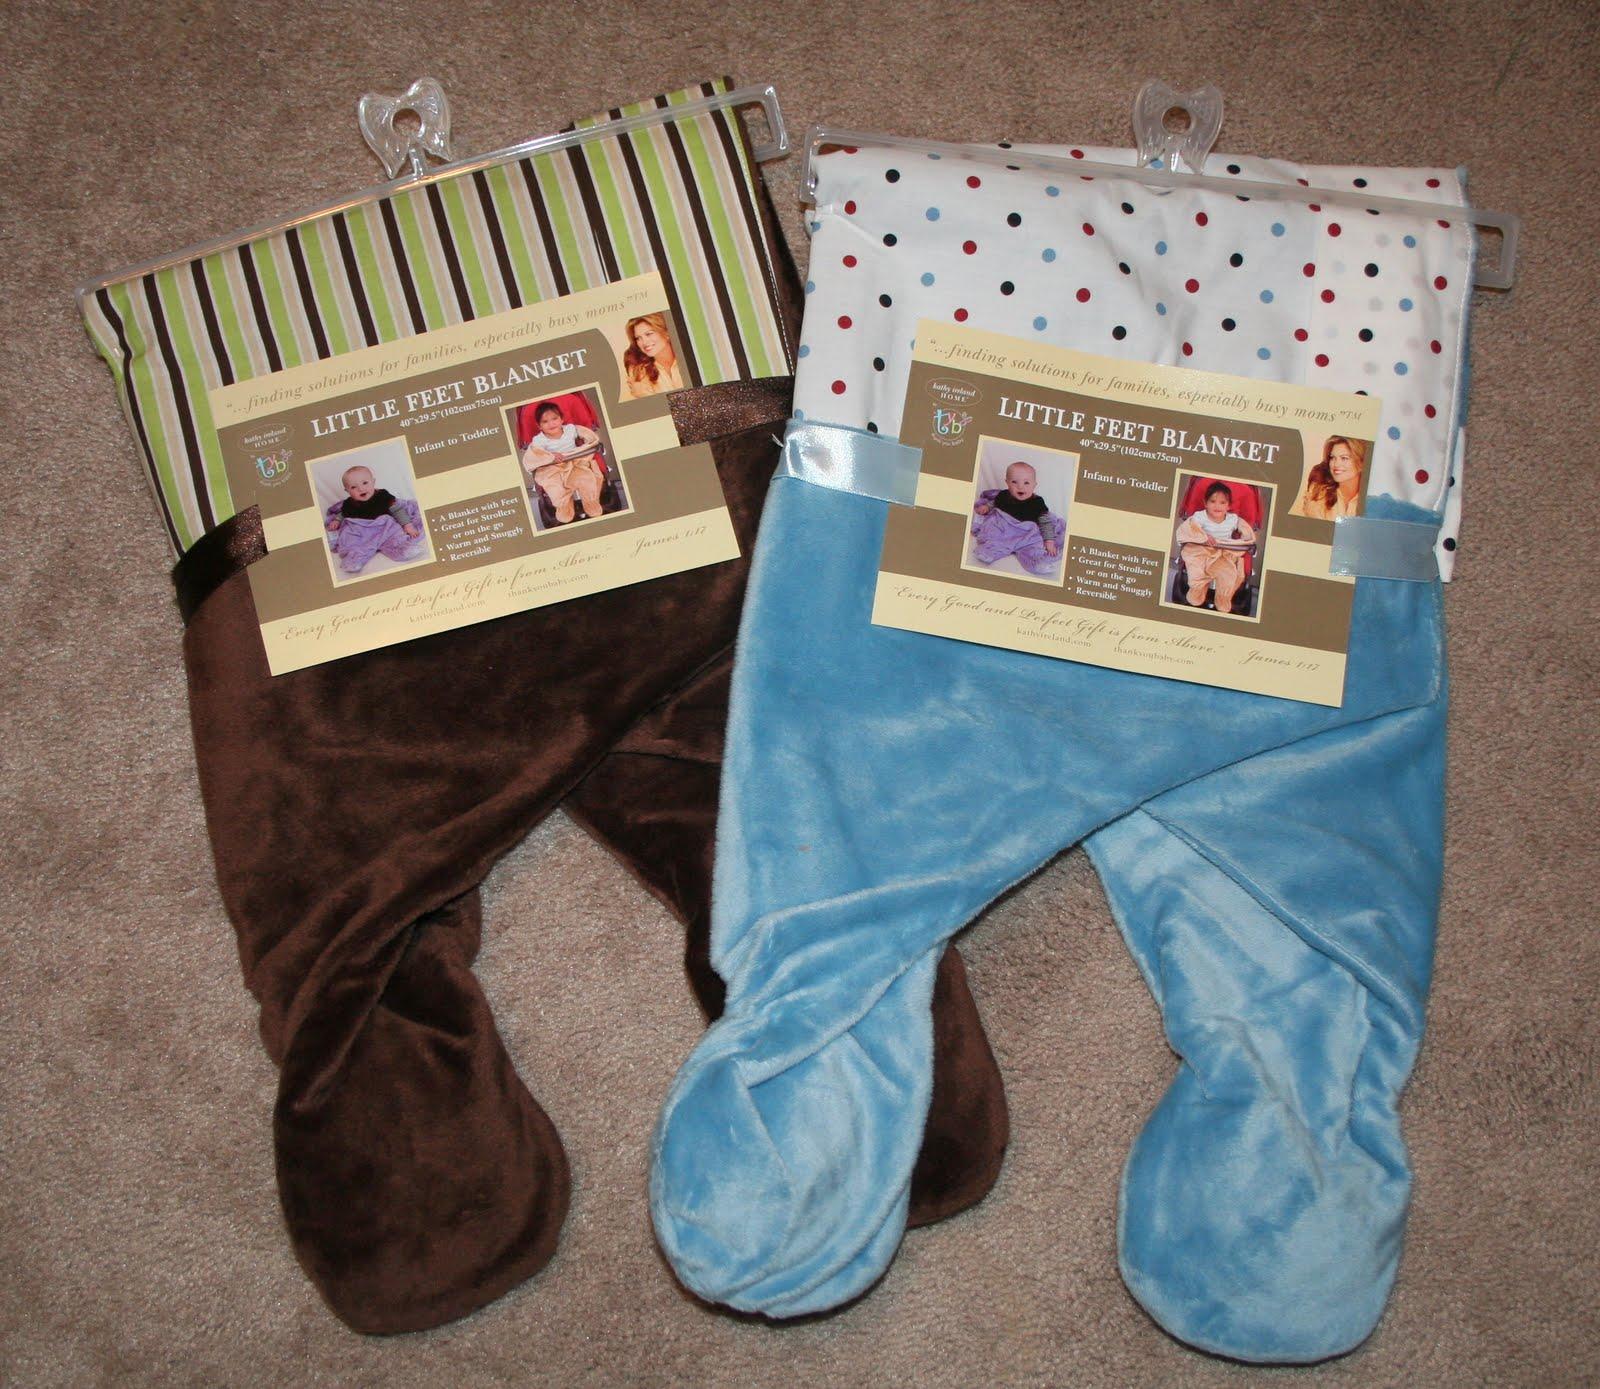 https://i1.wp.com/2.bp.blogspot.com/_TEy0xOVlybY/SxAQQOvXKEI/AAAAAAAAA2Q/yiX0zymreeA/s1600/little+feet+blankets.jpg